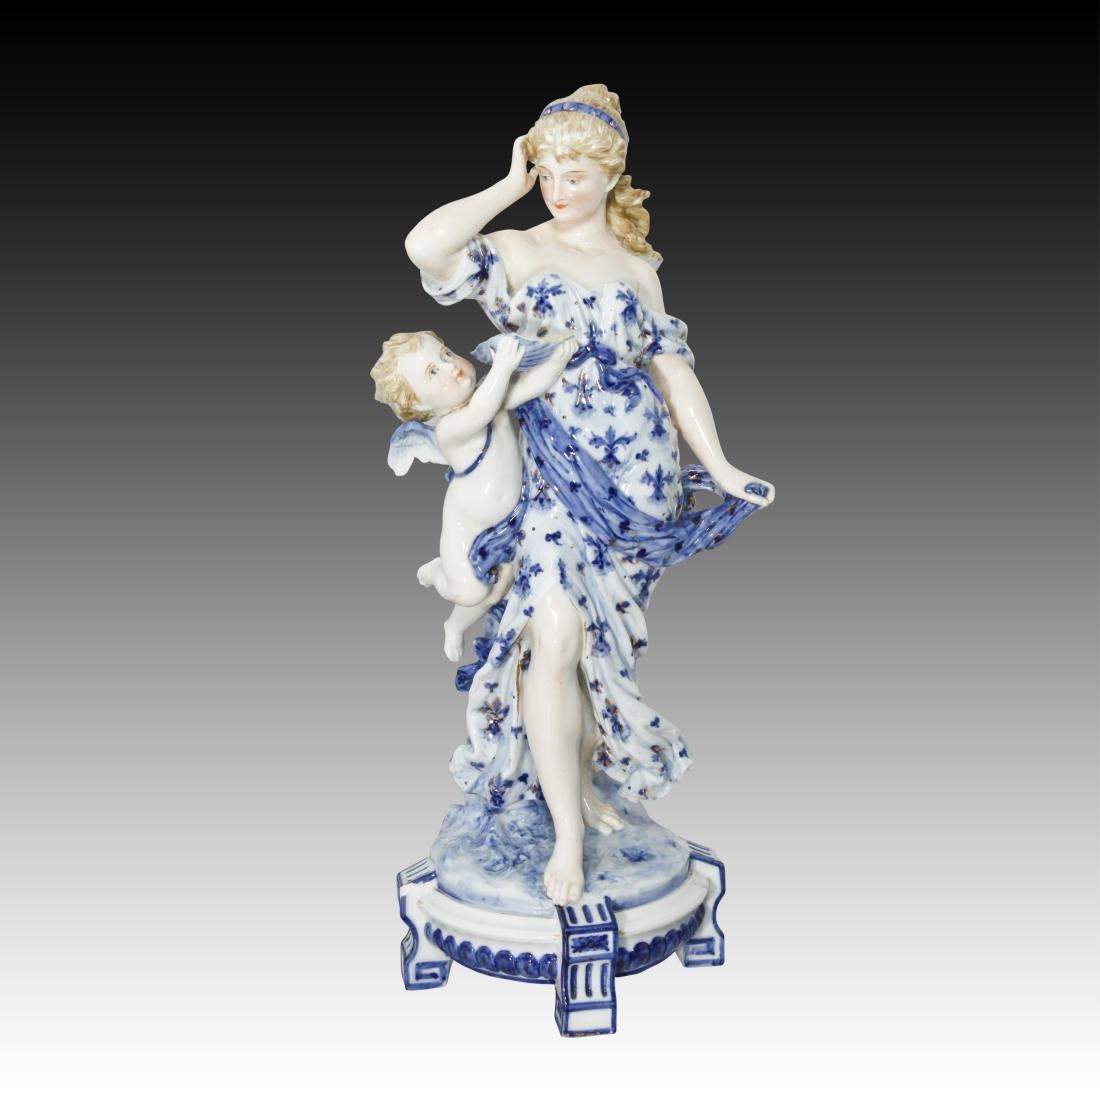 KPM Rubenesque Woman with Cherub Figurine 1049